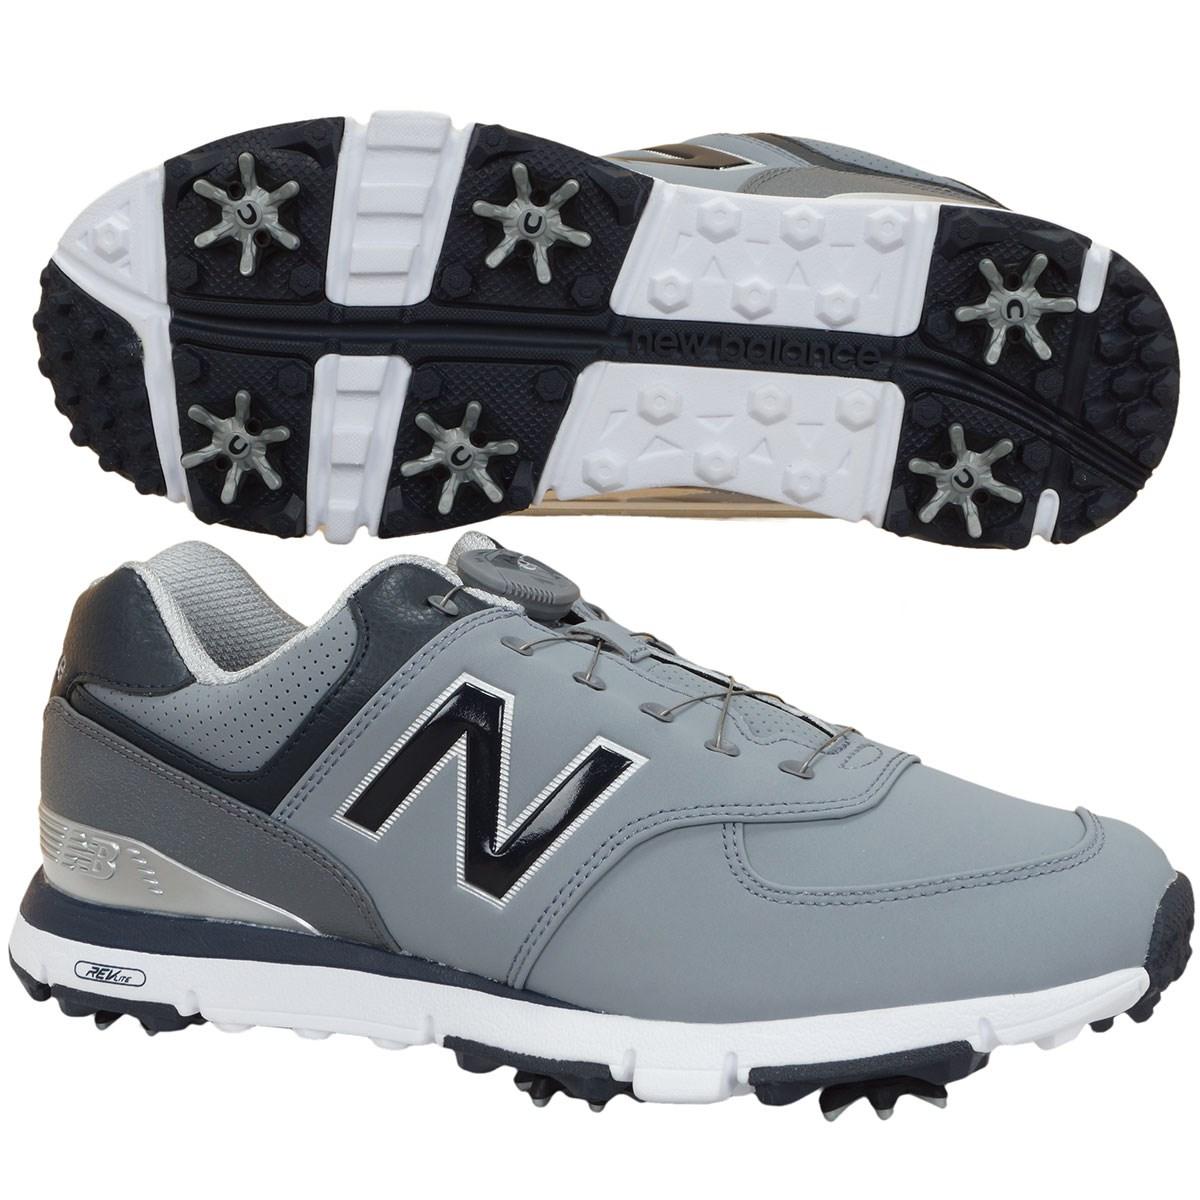 MGB574 ゴルフシューズ